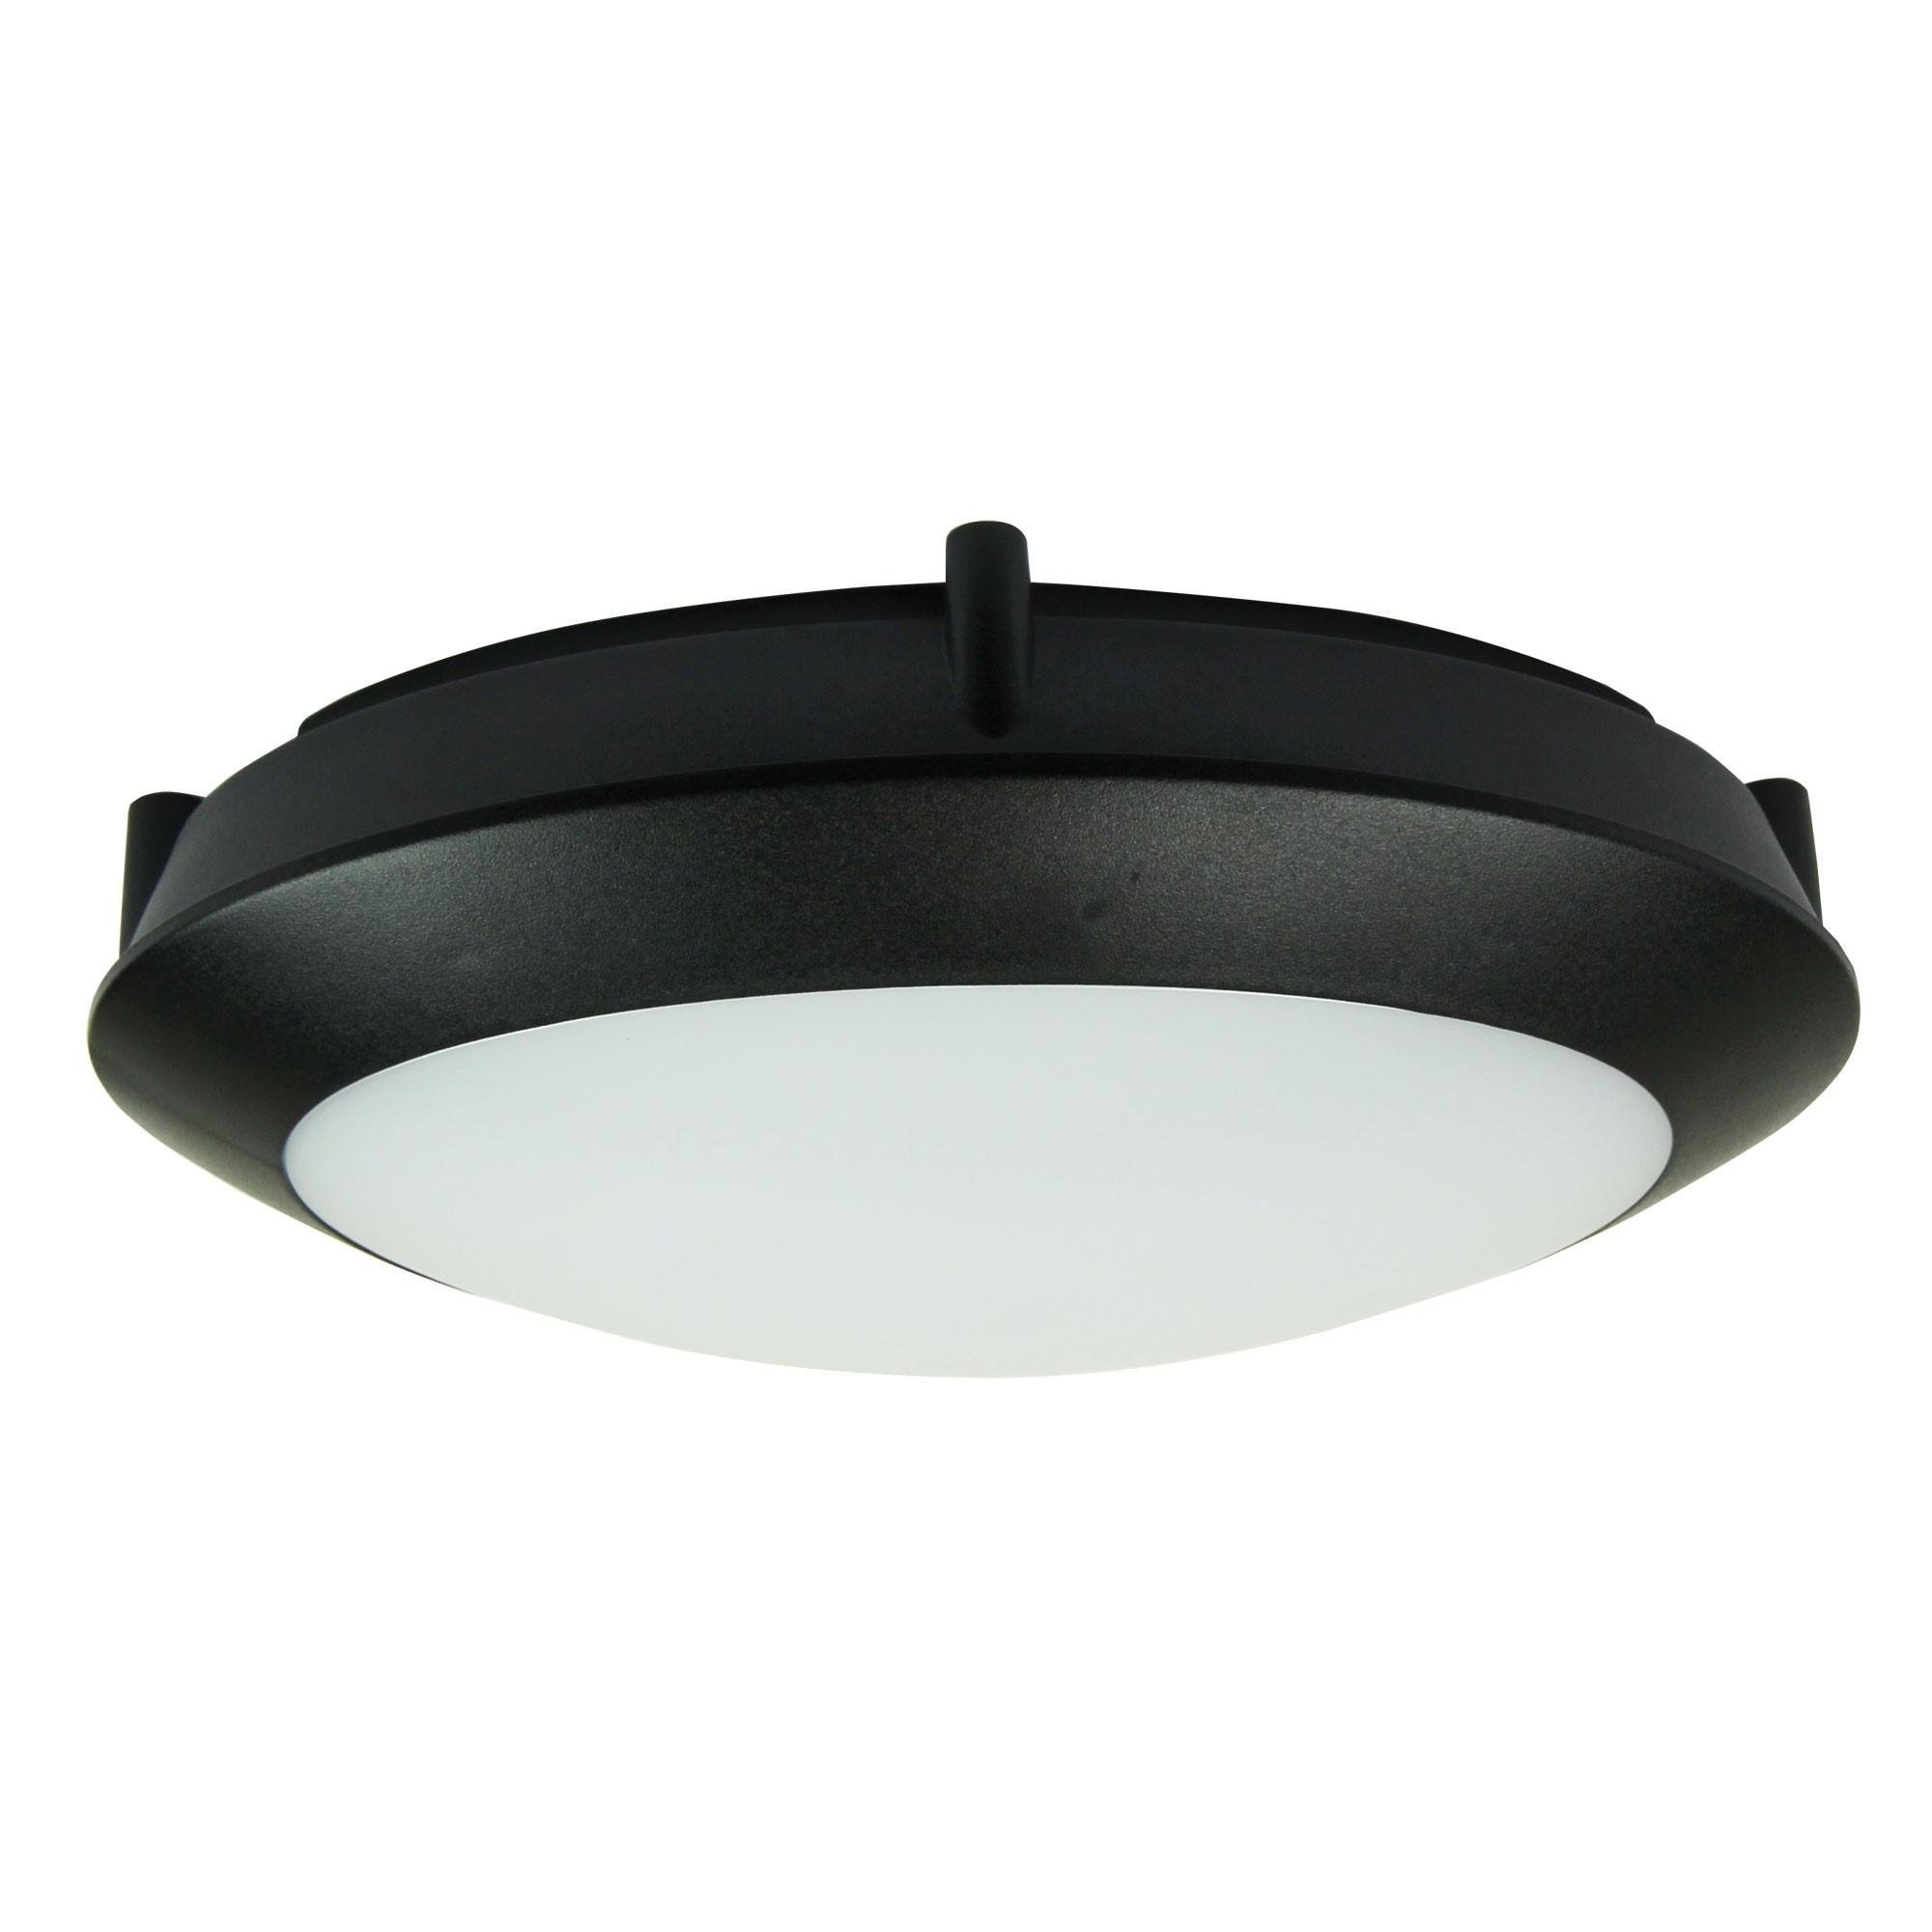 Duro IP66 Exterior LED Oyster Light, 20cm, Round, Black